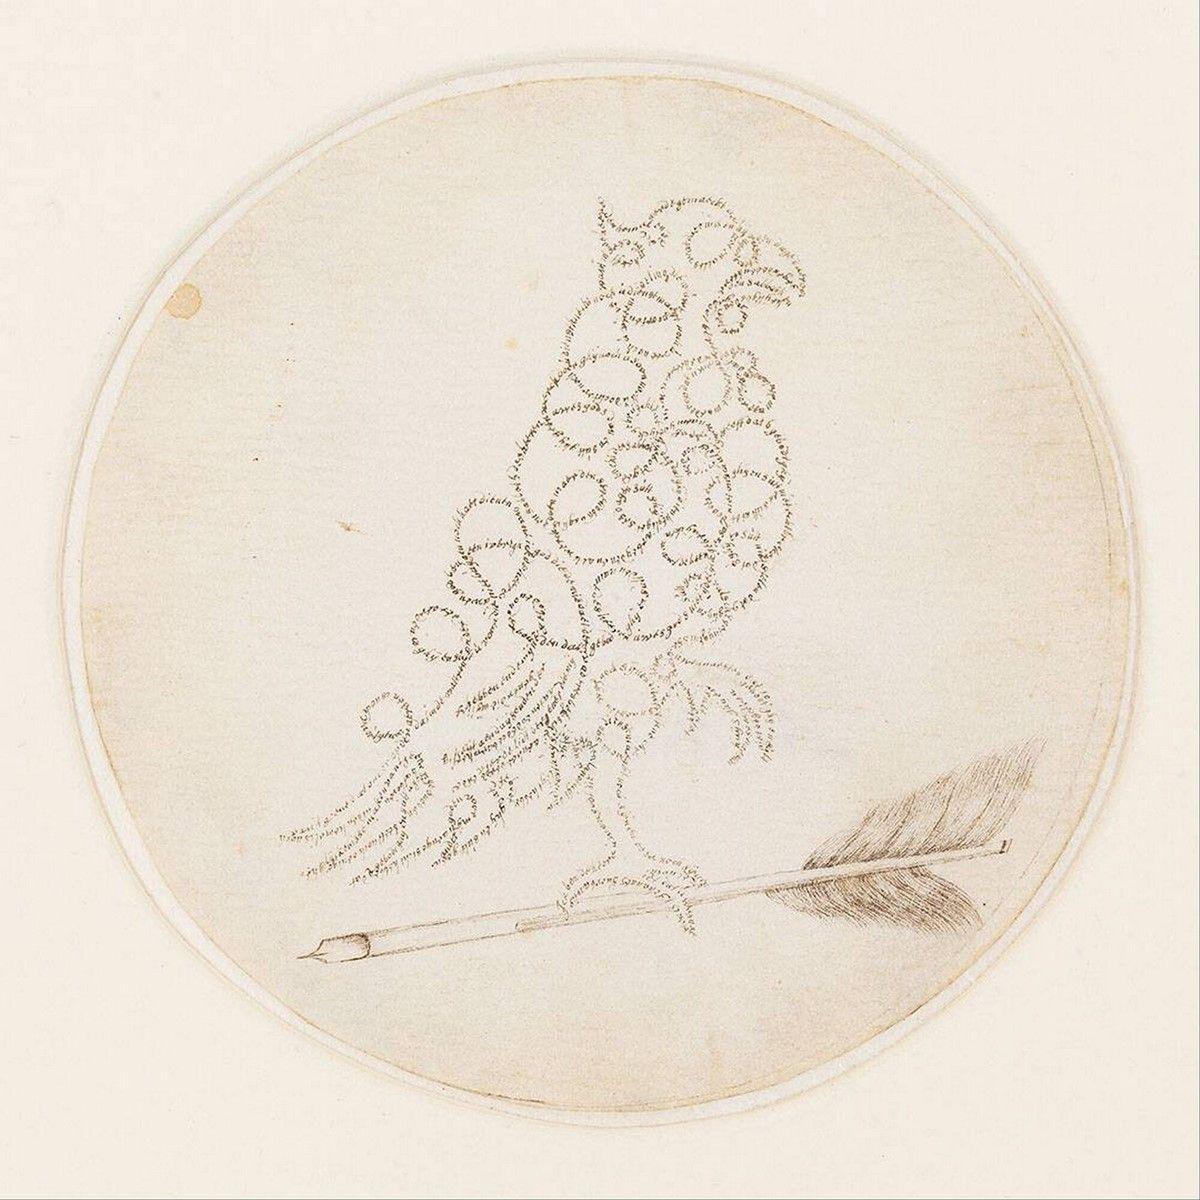 """Parrot Standing on a Writing Pen"", c. 1600/1700, J. Suerbants, Museum Boijmans Van Beuningen"